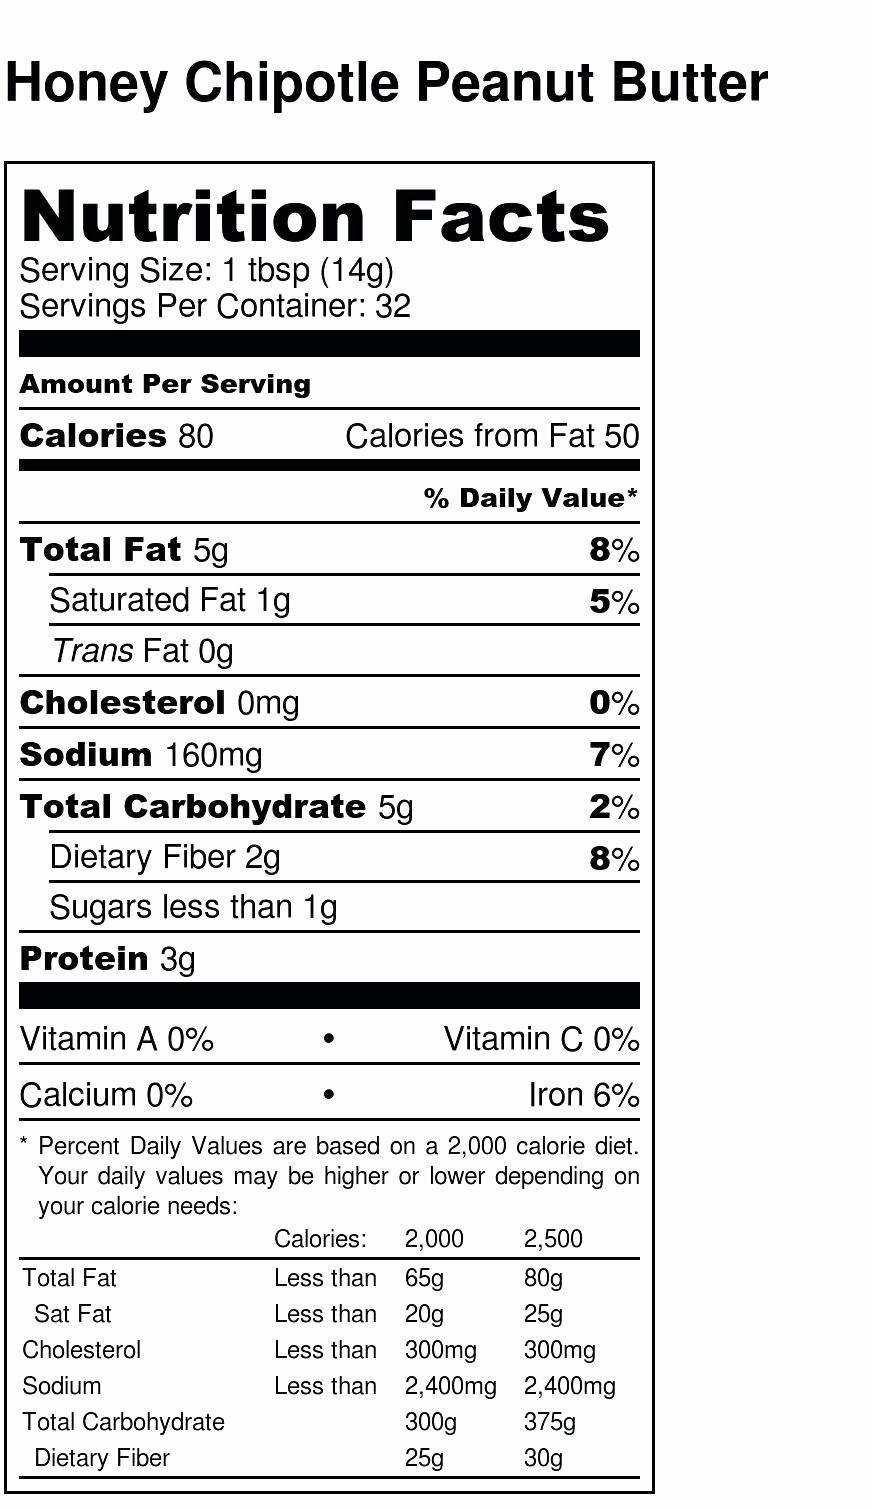 Nutrition Facts Label Template Excel Elegant Nutritional Label Template Excel Nutrition Ftempo